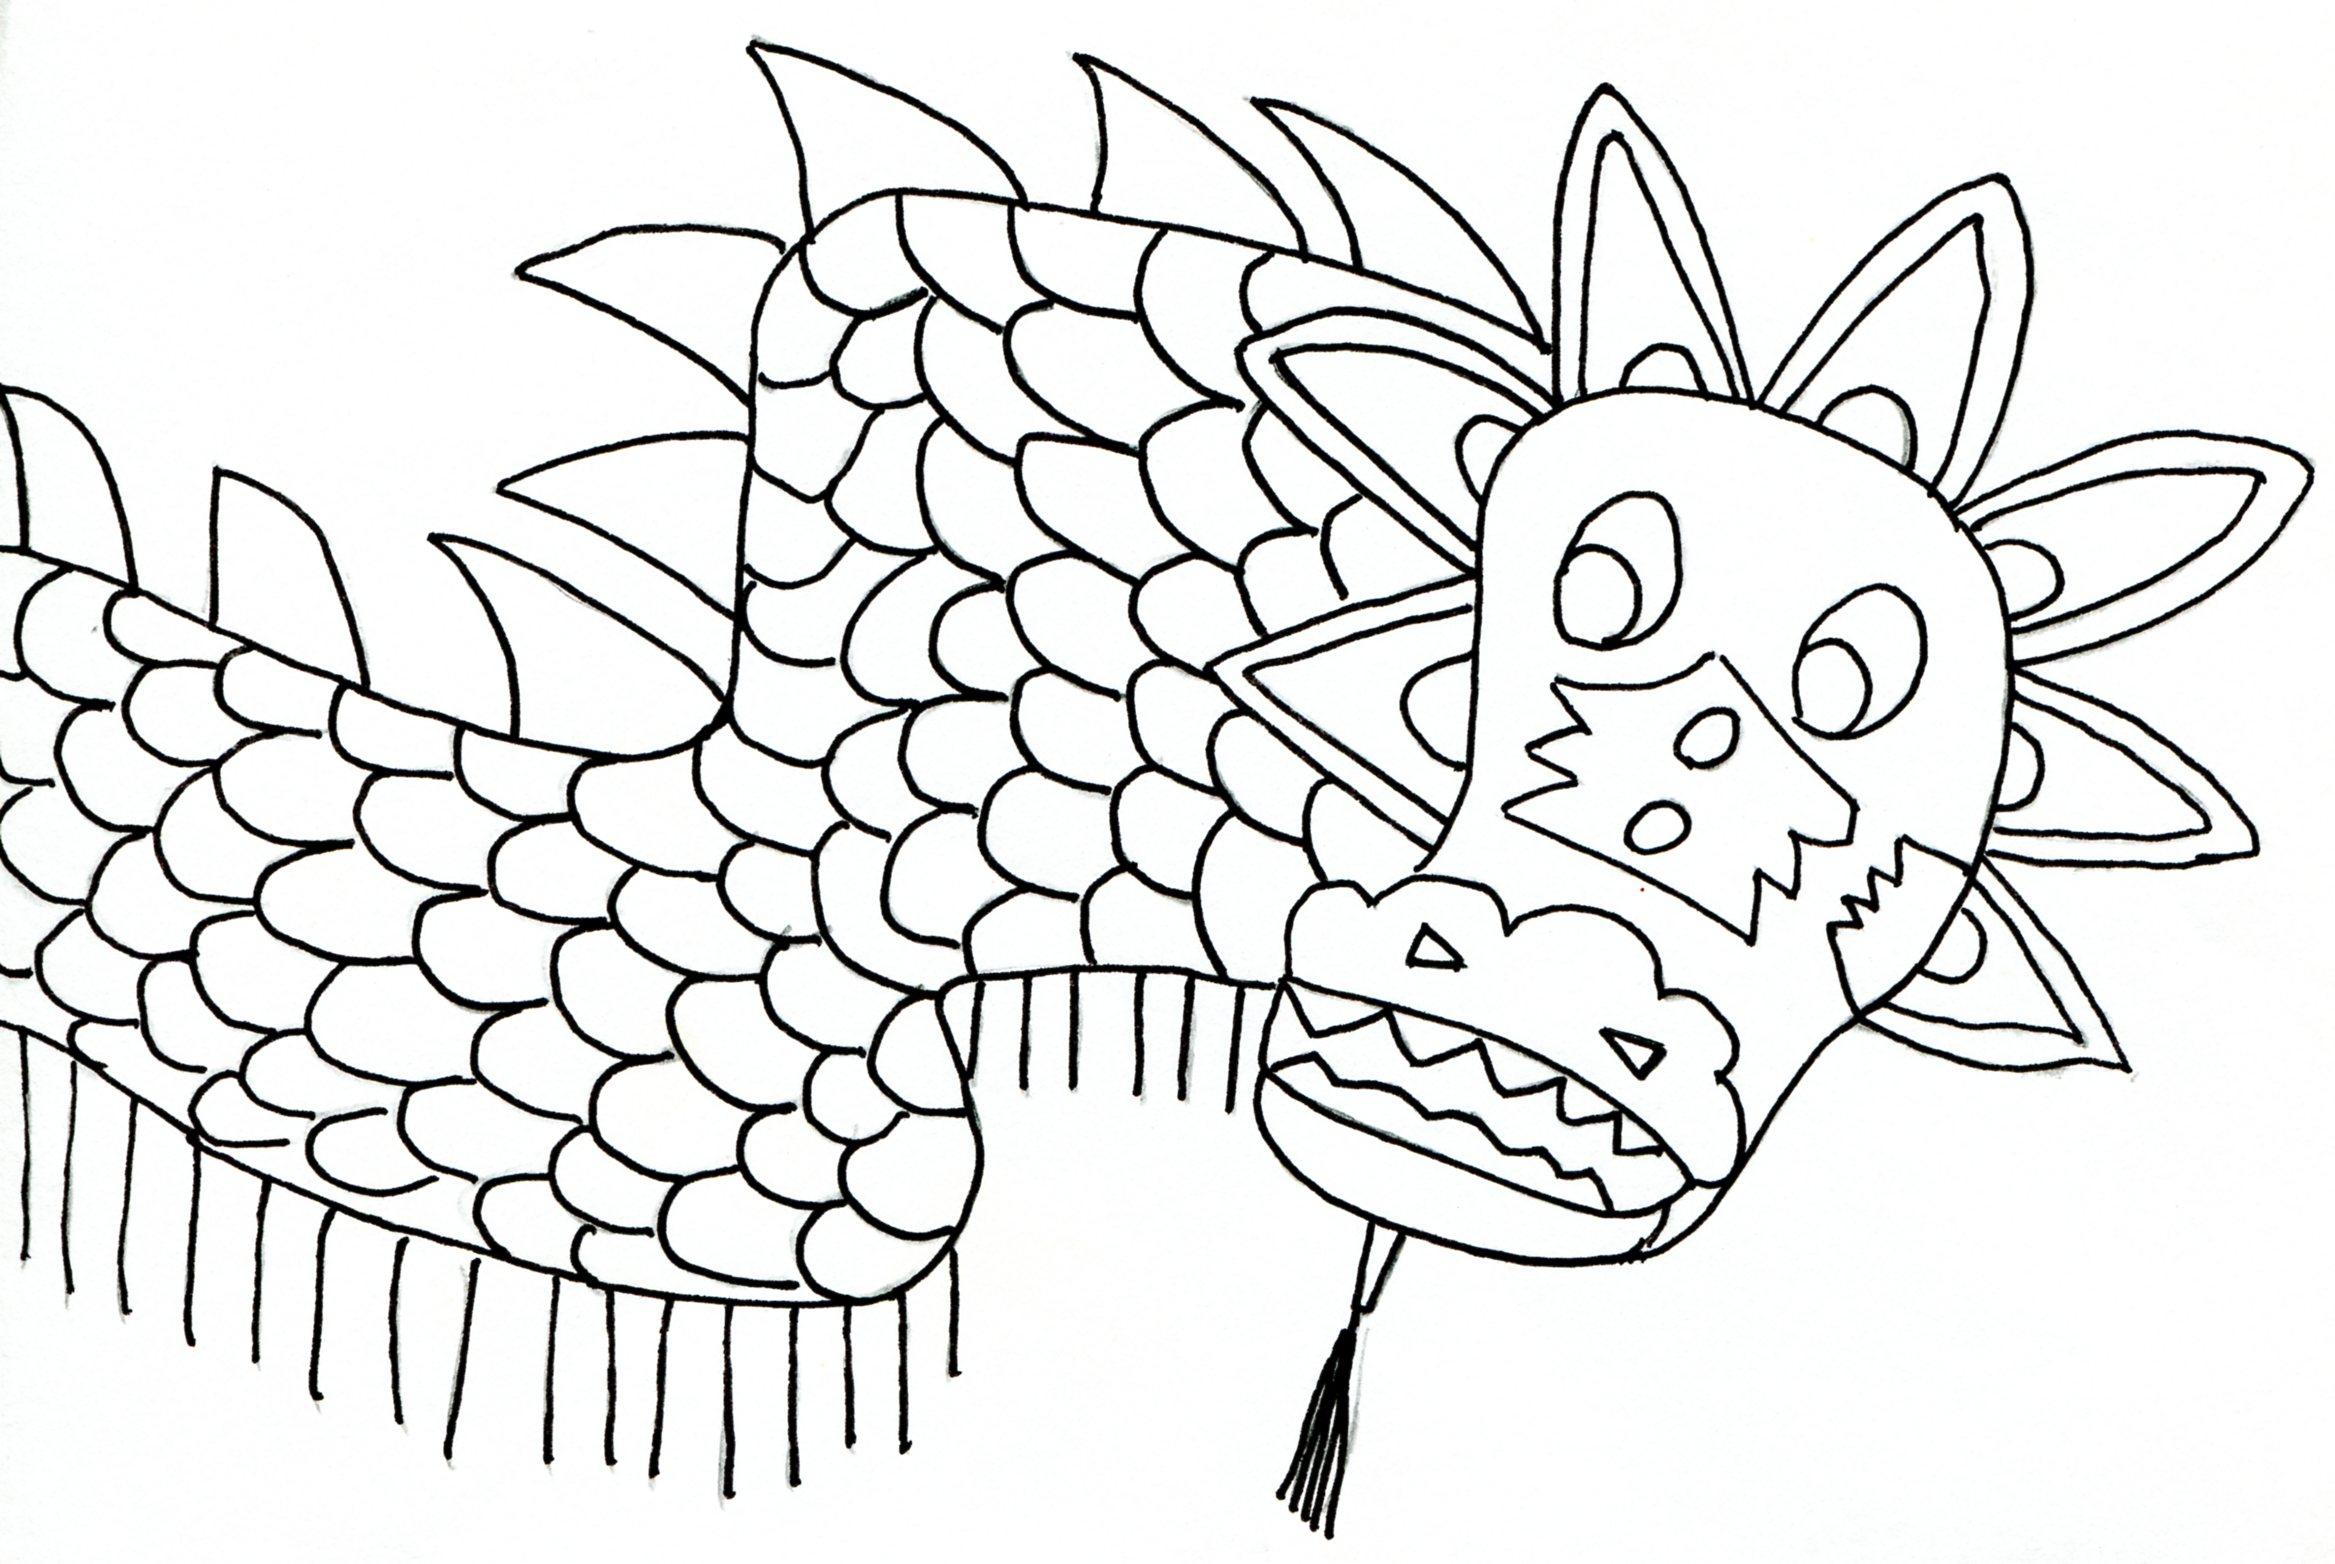 Dragon Drawing Template - jeppefm.tk